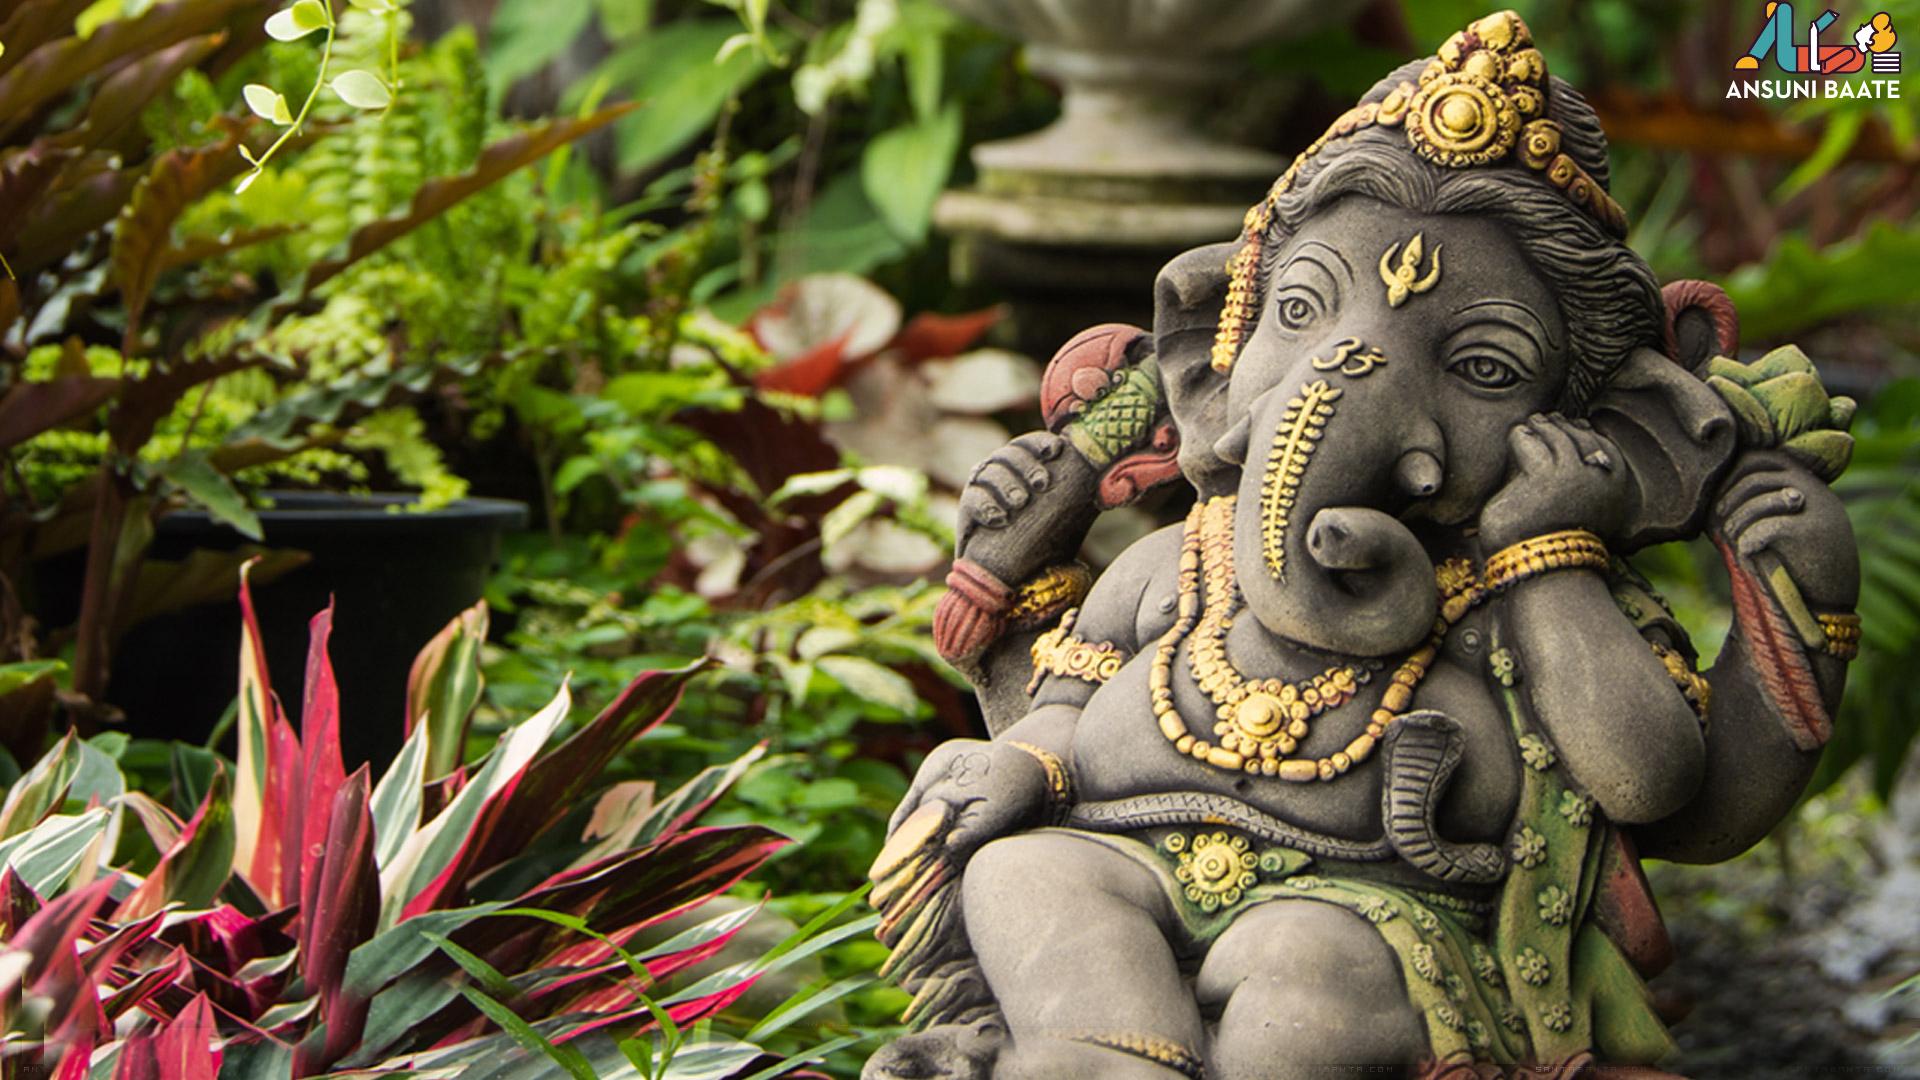 Ganesha Hd Wallpaper Posted By Ryan Cunningham